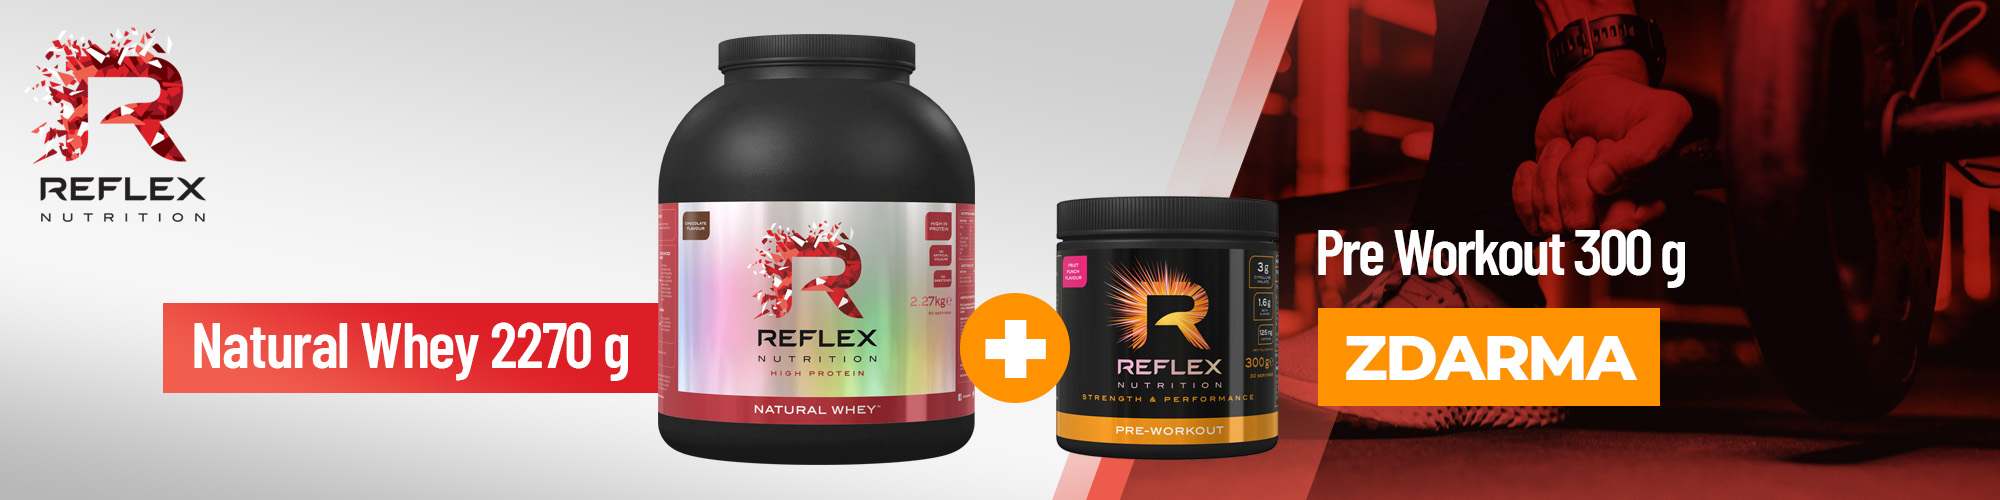 Reflex Natural Whey 2270g + Reflex Pre Workout 300g ZDARMA